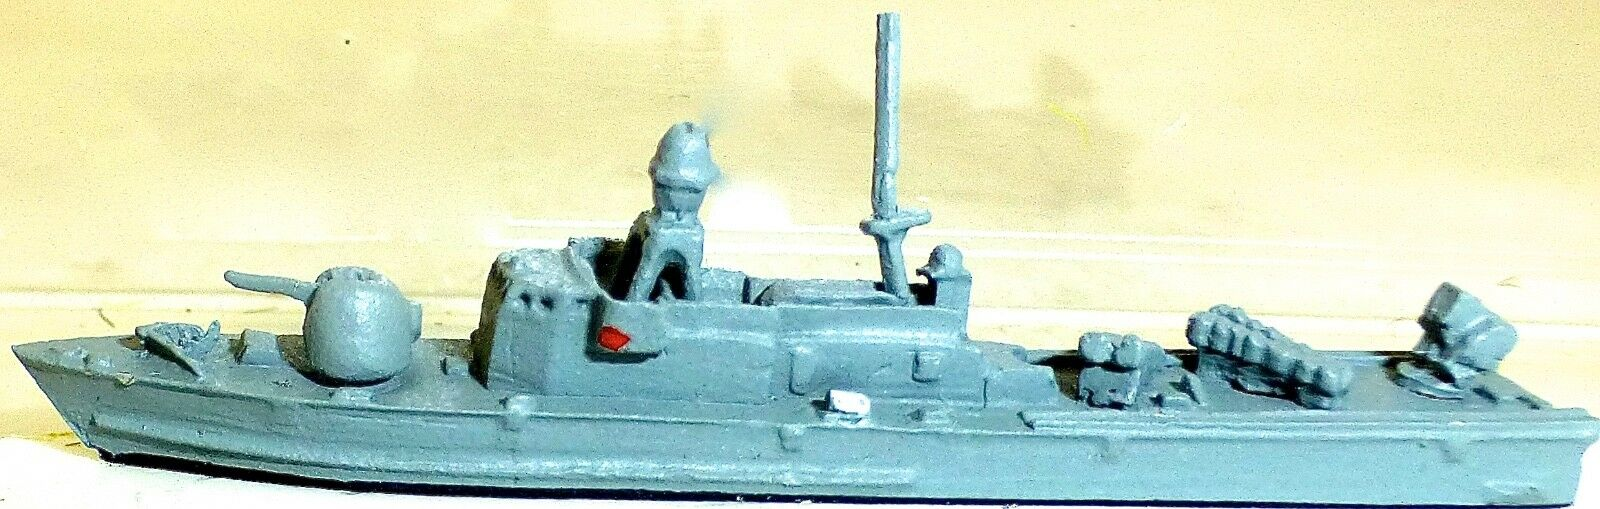 Wiesel Albatros ALK ALK ALK 31a Maqueta de barco 1 1250 shpz26 å ea9421